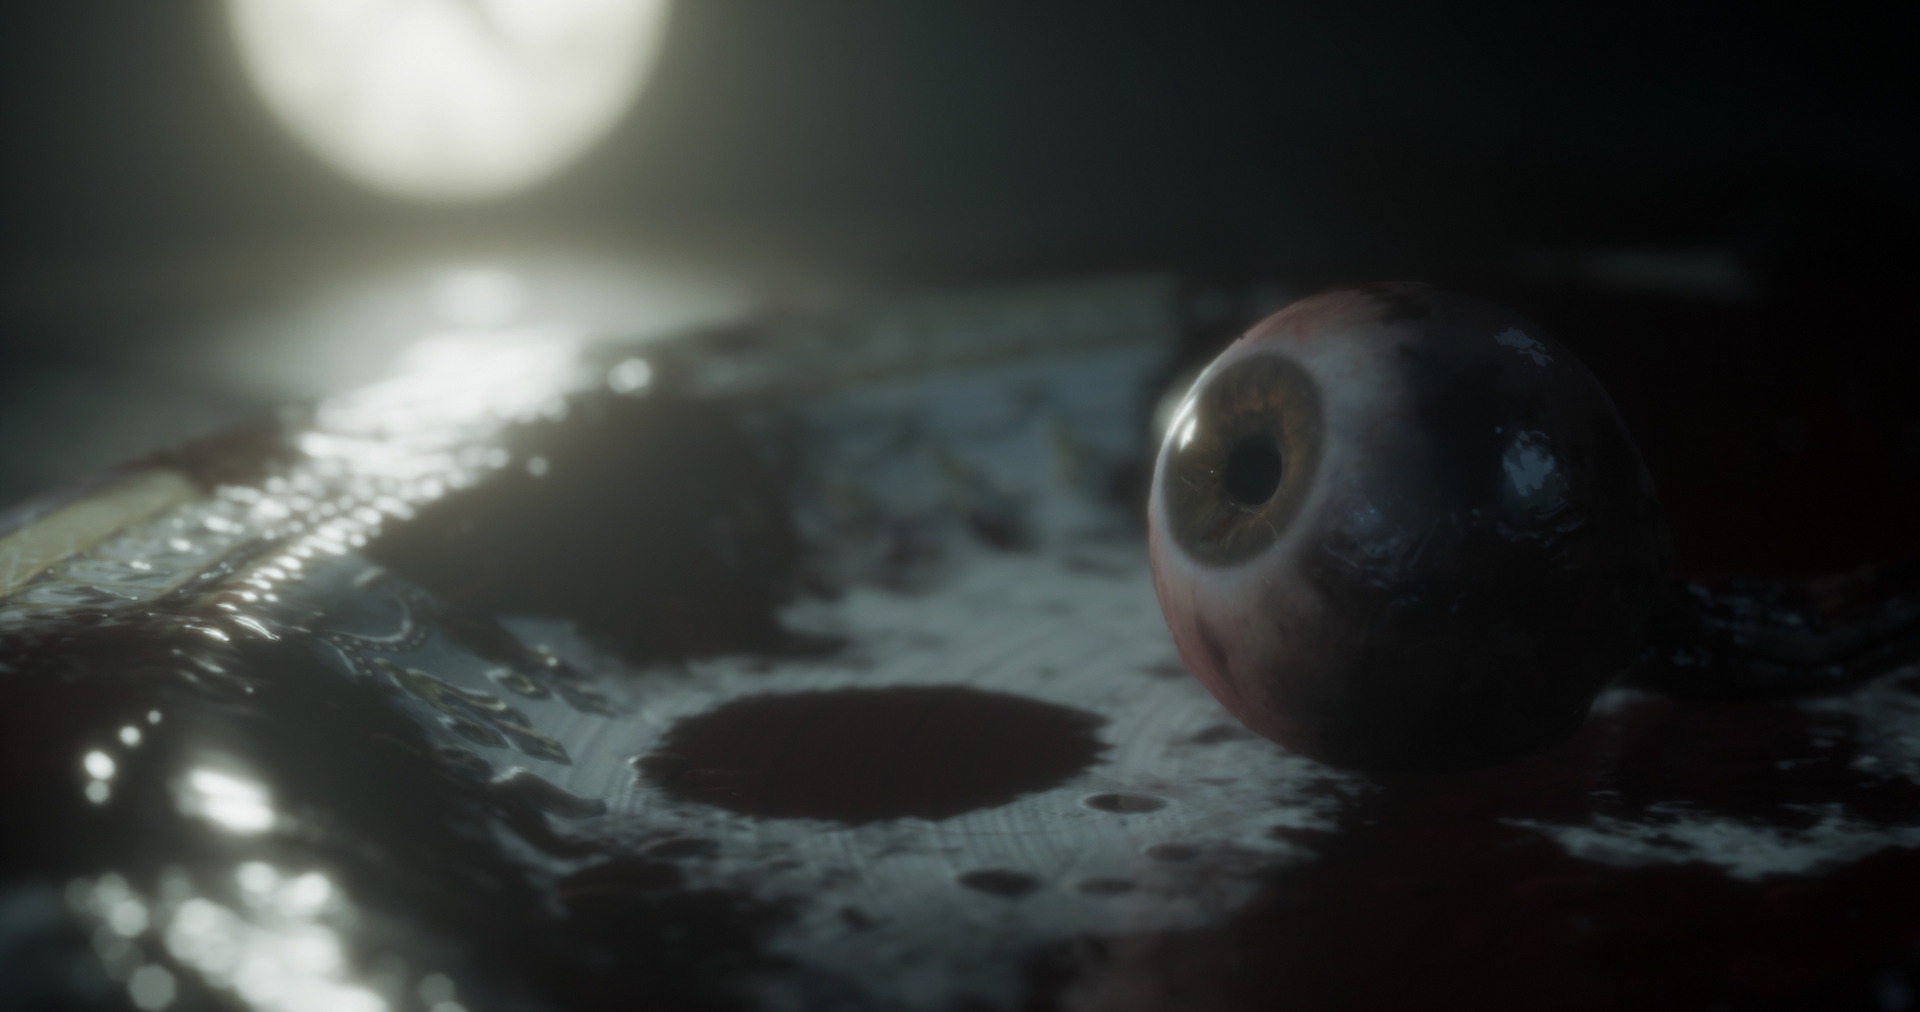 Первый трейлер и скриншоты некстген-адвенчуры Nascence